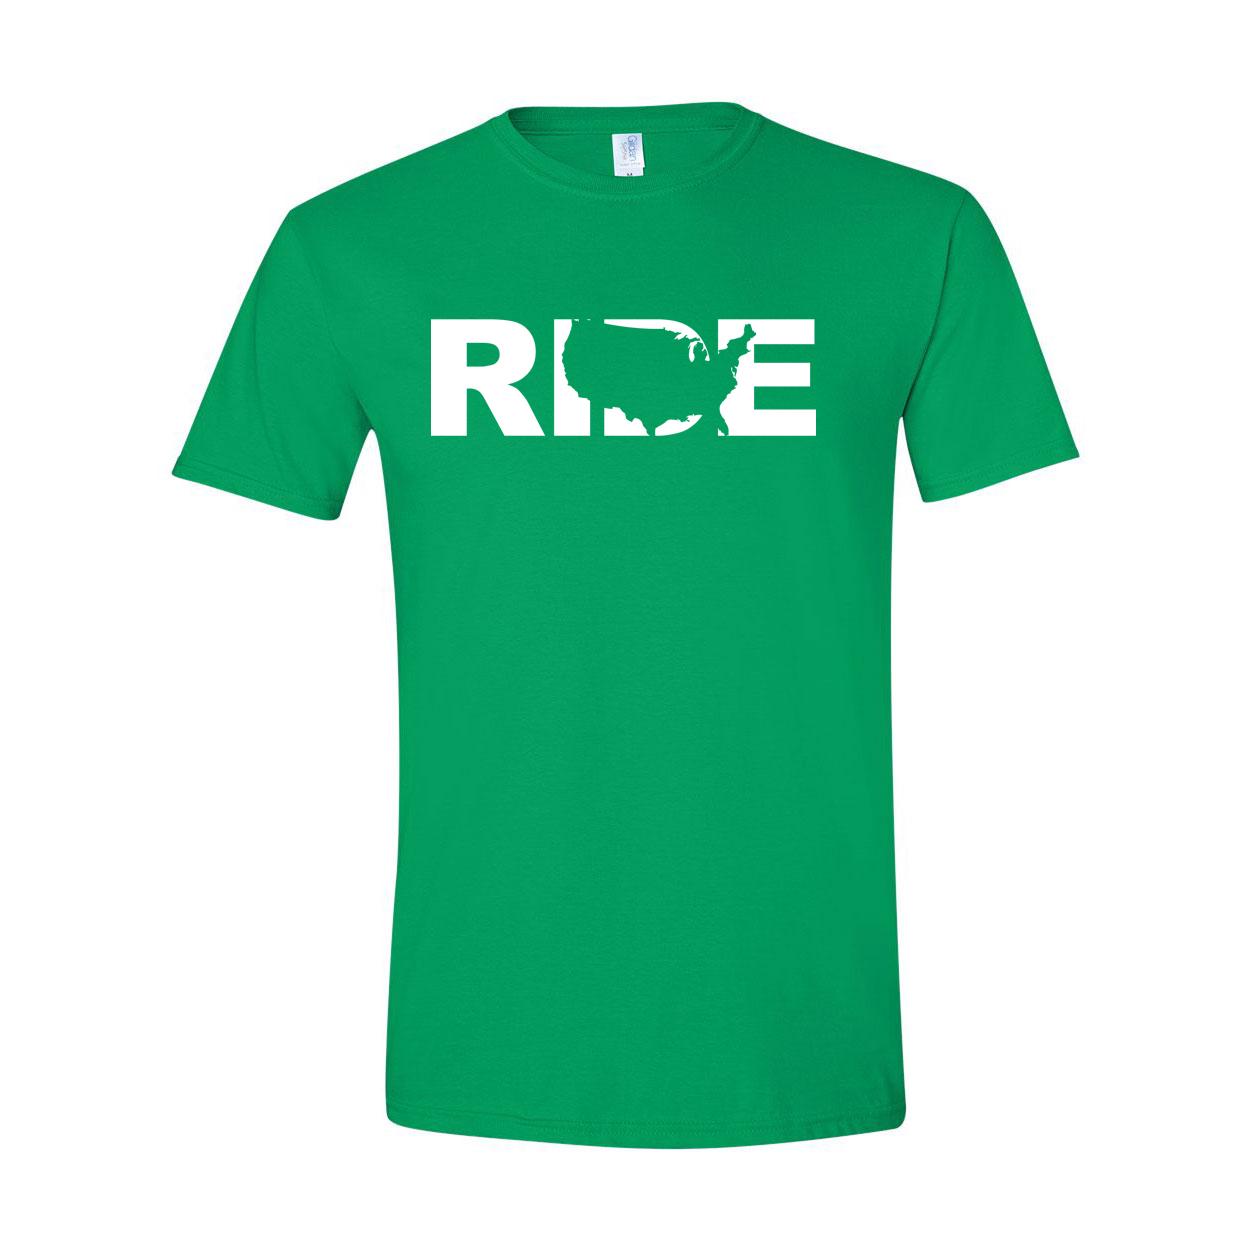 Ride United States Classic T-Shirt Irish Green (White Logo)